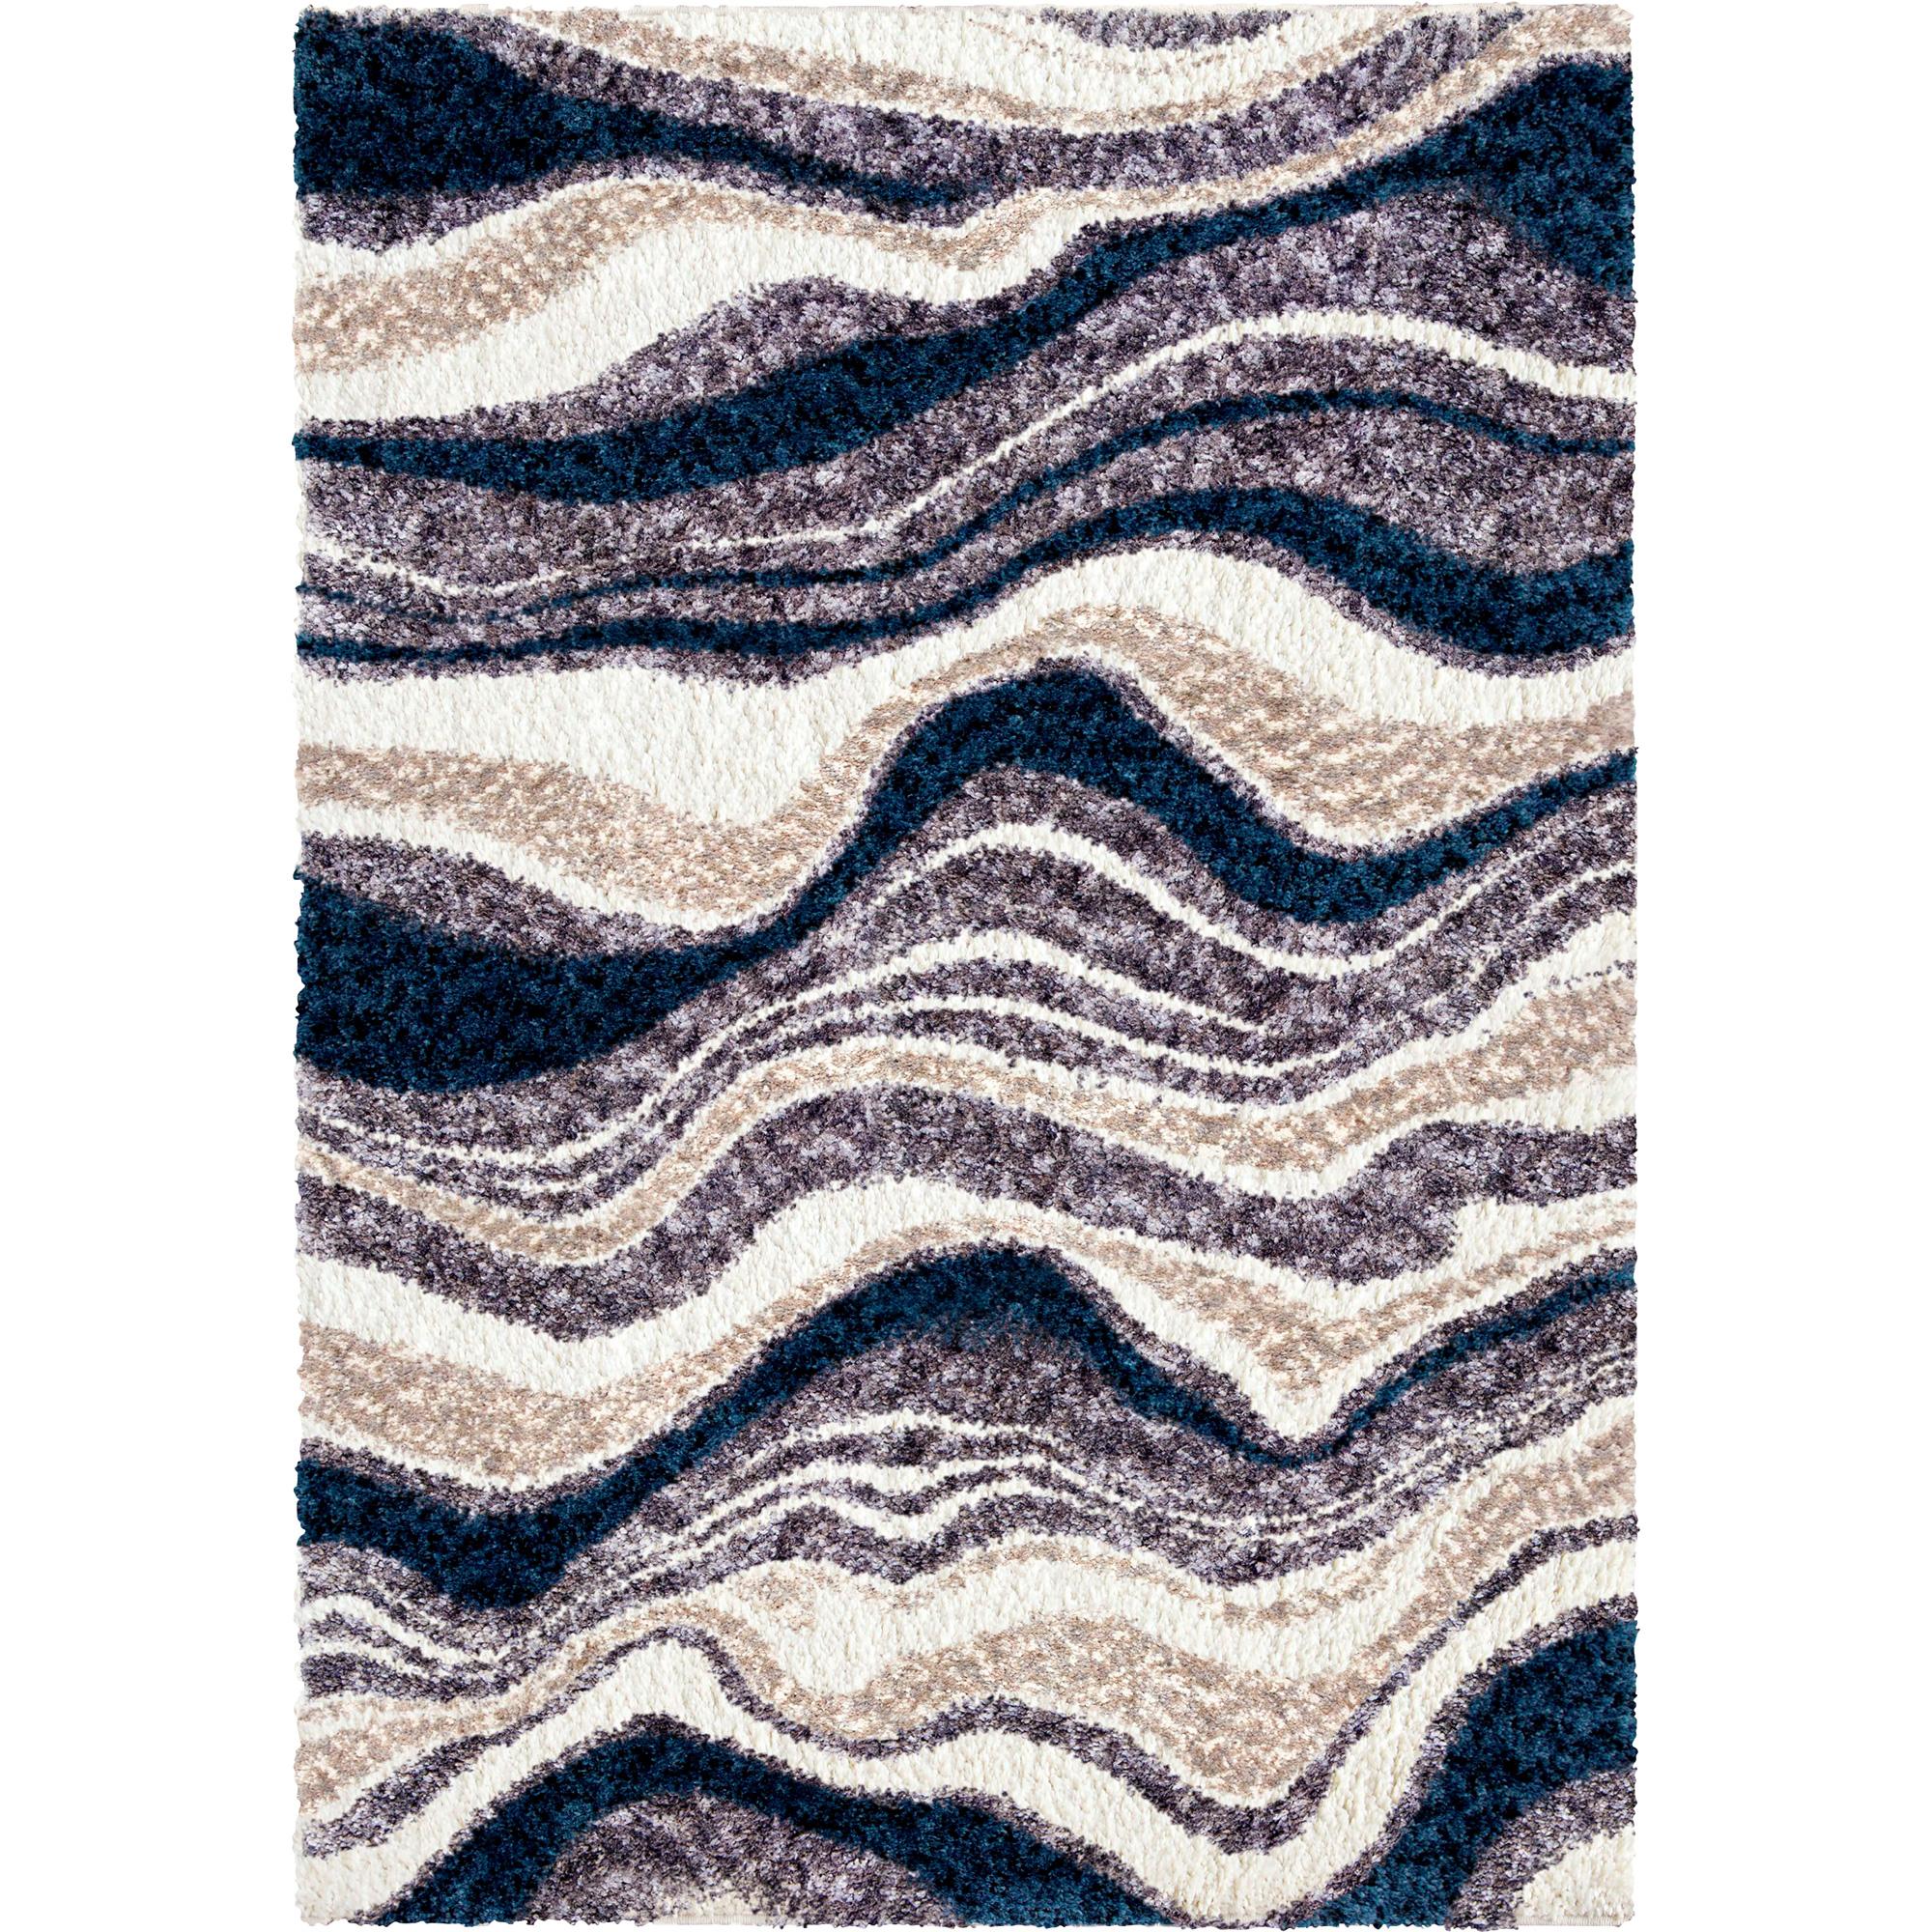 Orian | Cotton Tail Agate Denim 7x10 Area Rug